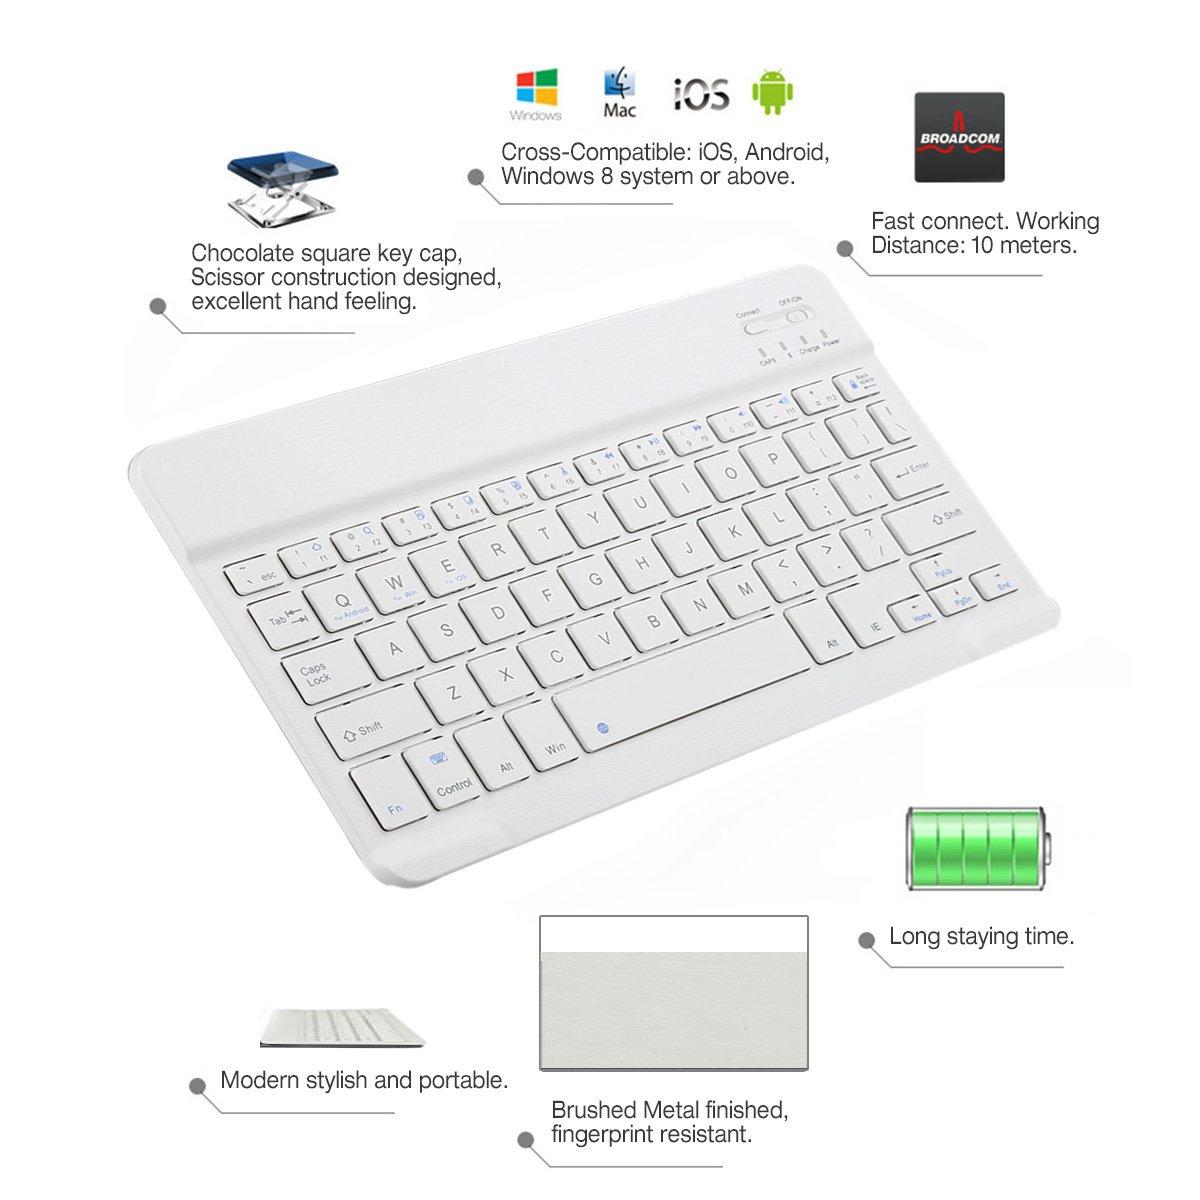 CoastaCloud Portable 10-inch Ultra Slim ABS Wireless Bluetooth Keyboard for iPad 10.5, iPad 9.7'', iPad Pro, iPad Air, iPad 2/3/4, Galaxy Tab Note and Any iOS, Android, Windows Tablets (White) by CoastaCloud (Image #7)